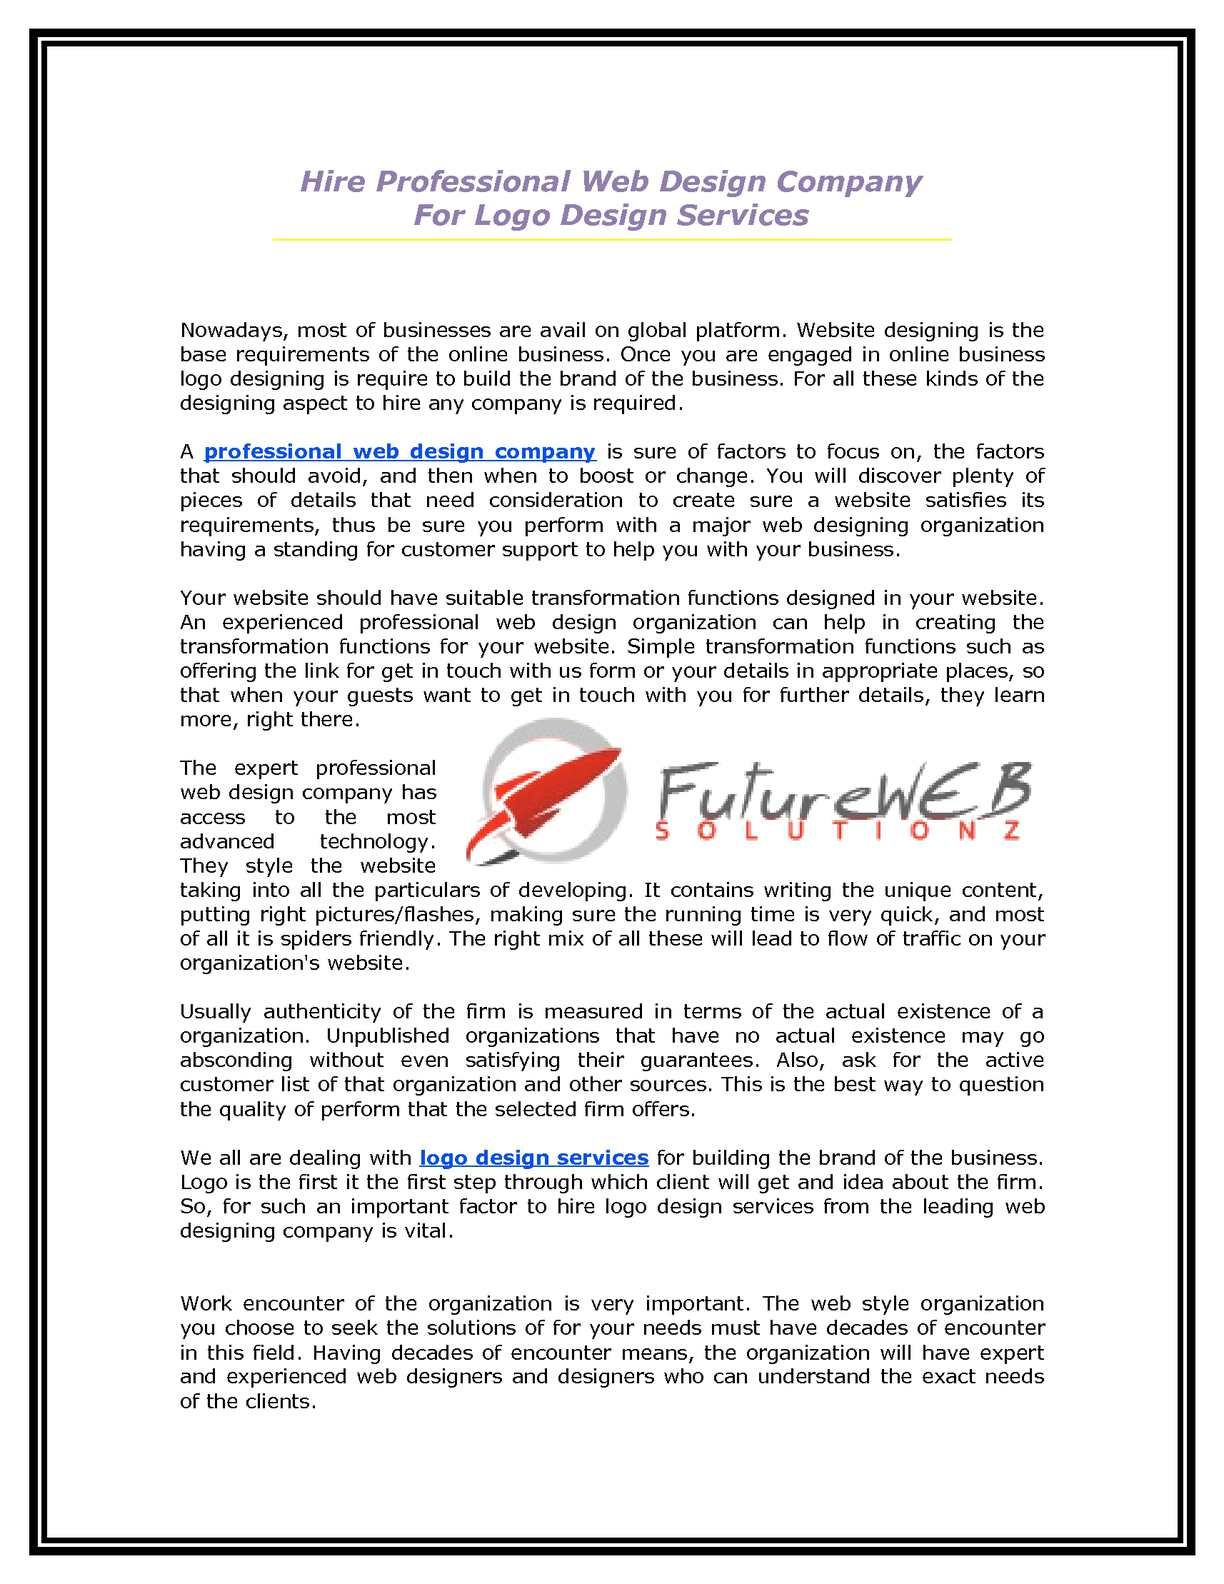 Calameo 2 Hire Professional Web Design Company For Logo Design Services